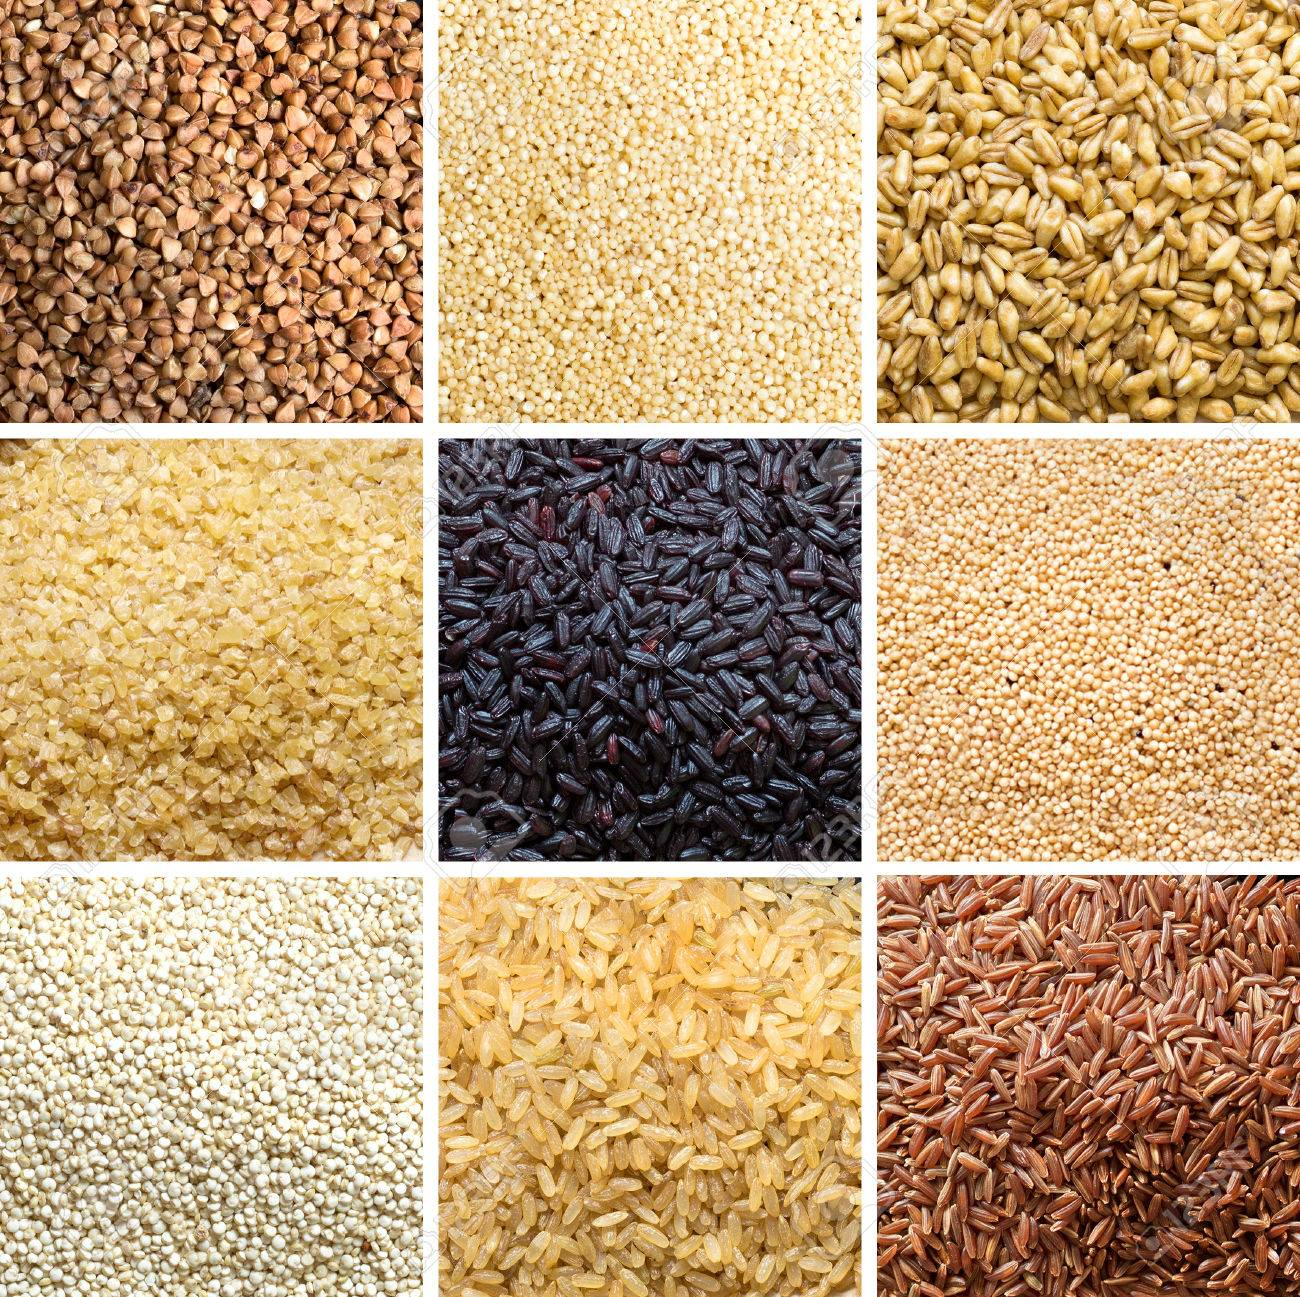 Collage of 9 cereals: buckwheat, millet, spelt, bulgur, black rice, amaranth, quinoa, brown rice, red rice Archivio Fotografico - 35811707